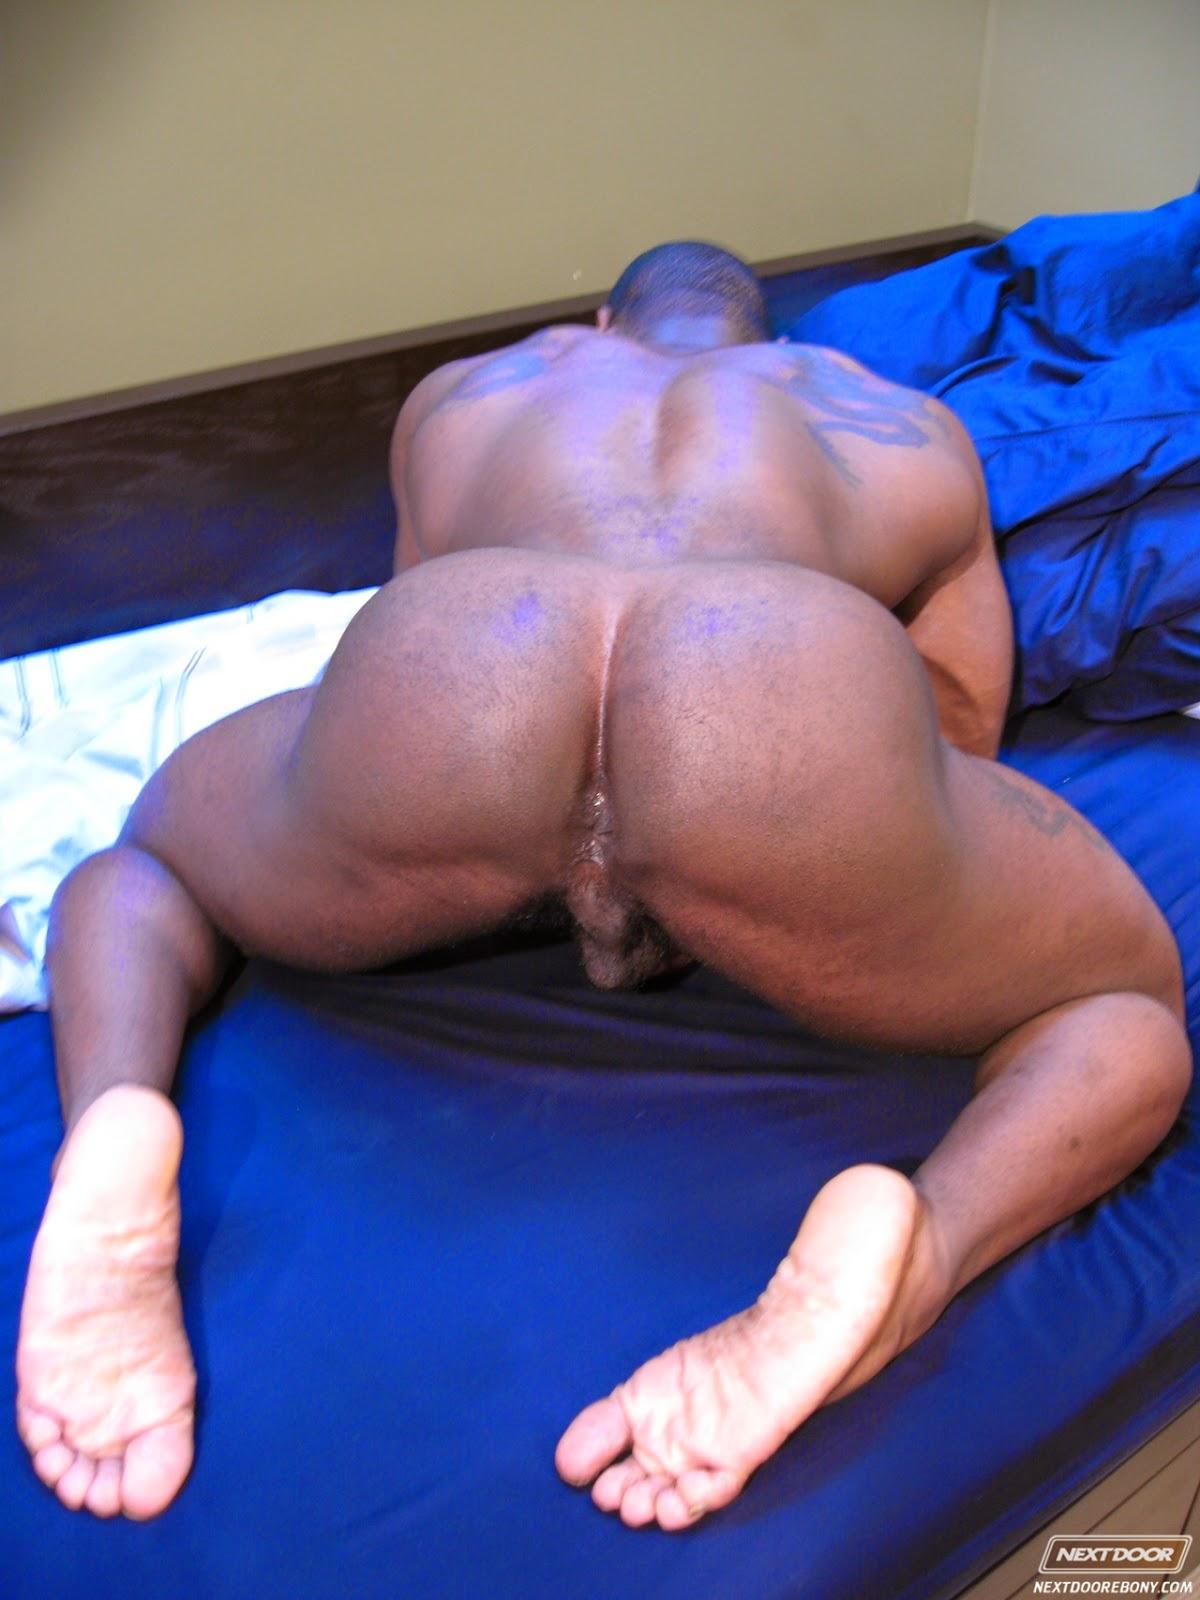 Booty fat ass ass eating sexy black men black gay porn muscle thug blackgayporn